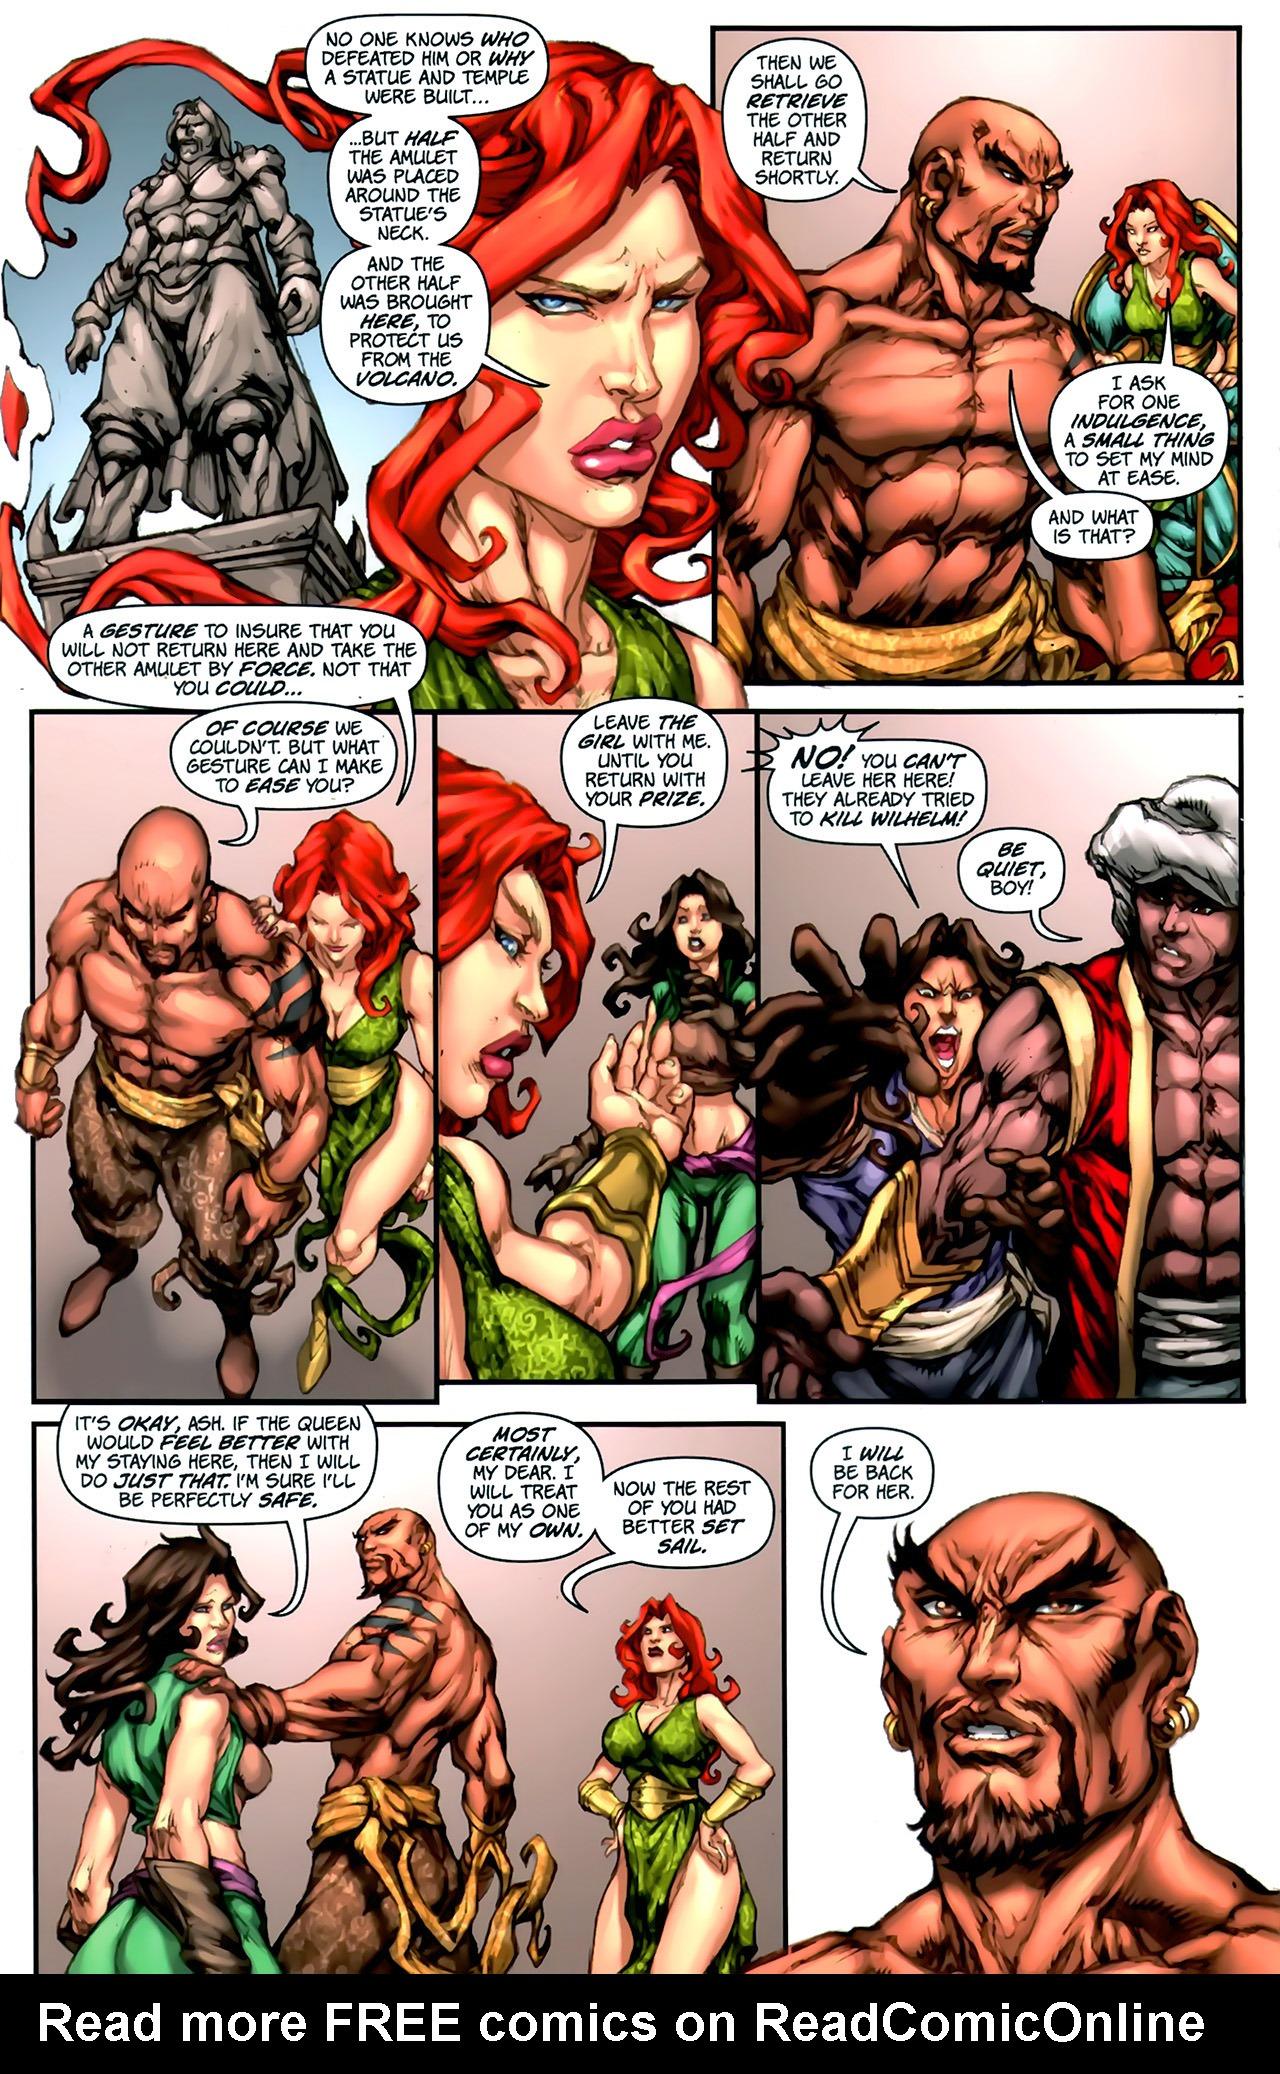 Read online 1001 Arabian Nights: The Adventures of Sinbad comic -  Issue #2 - 18